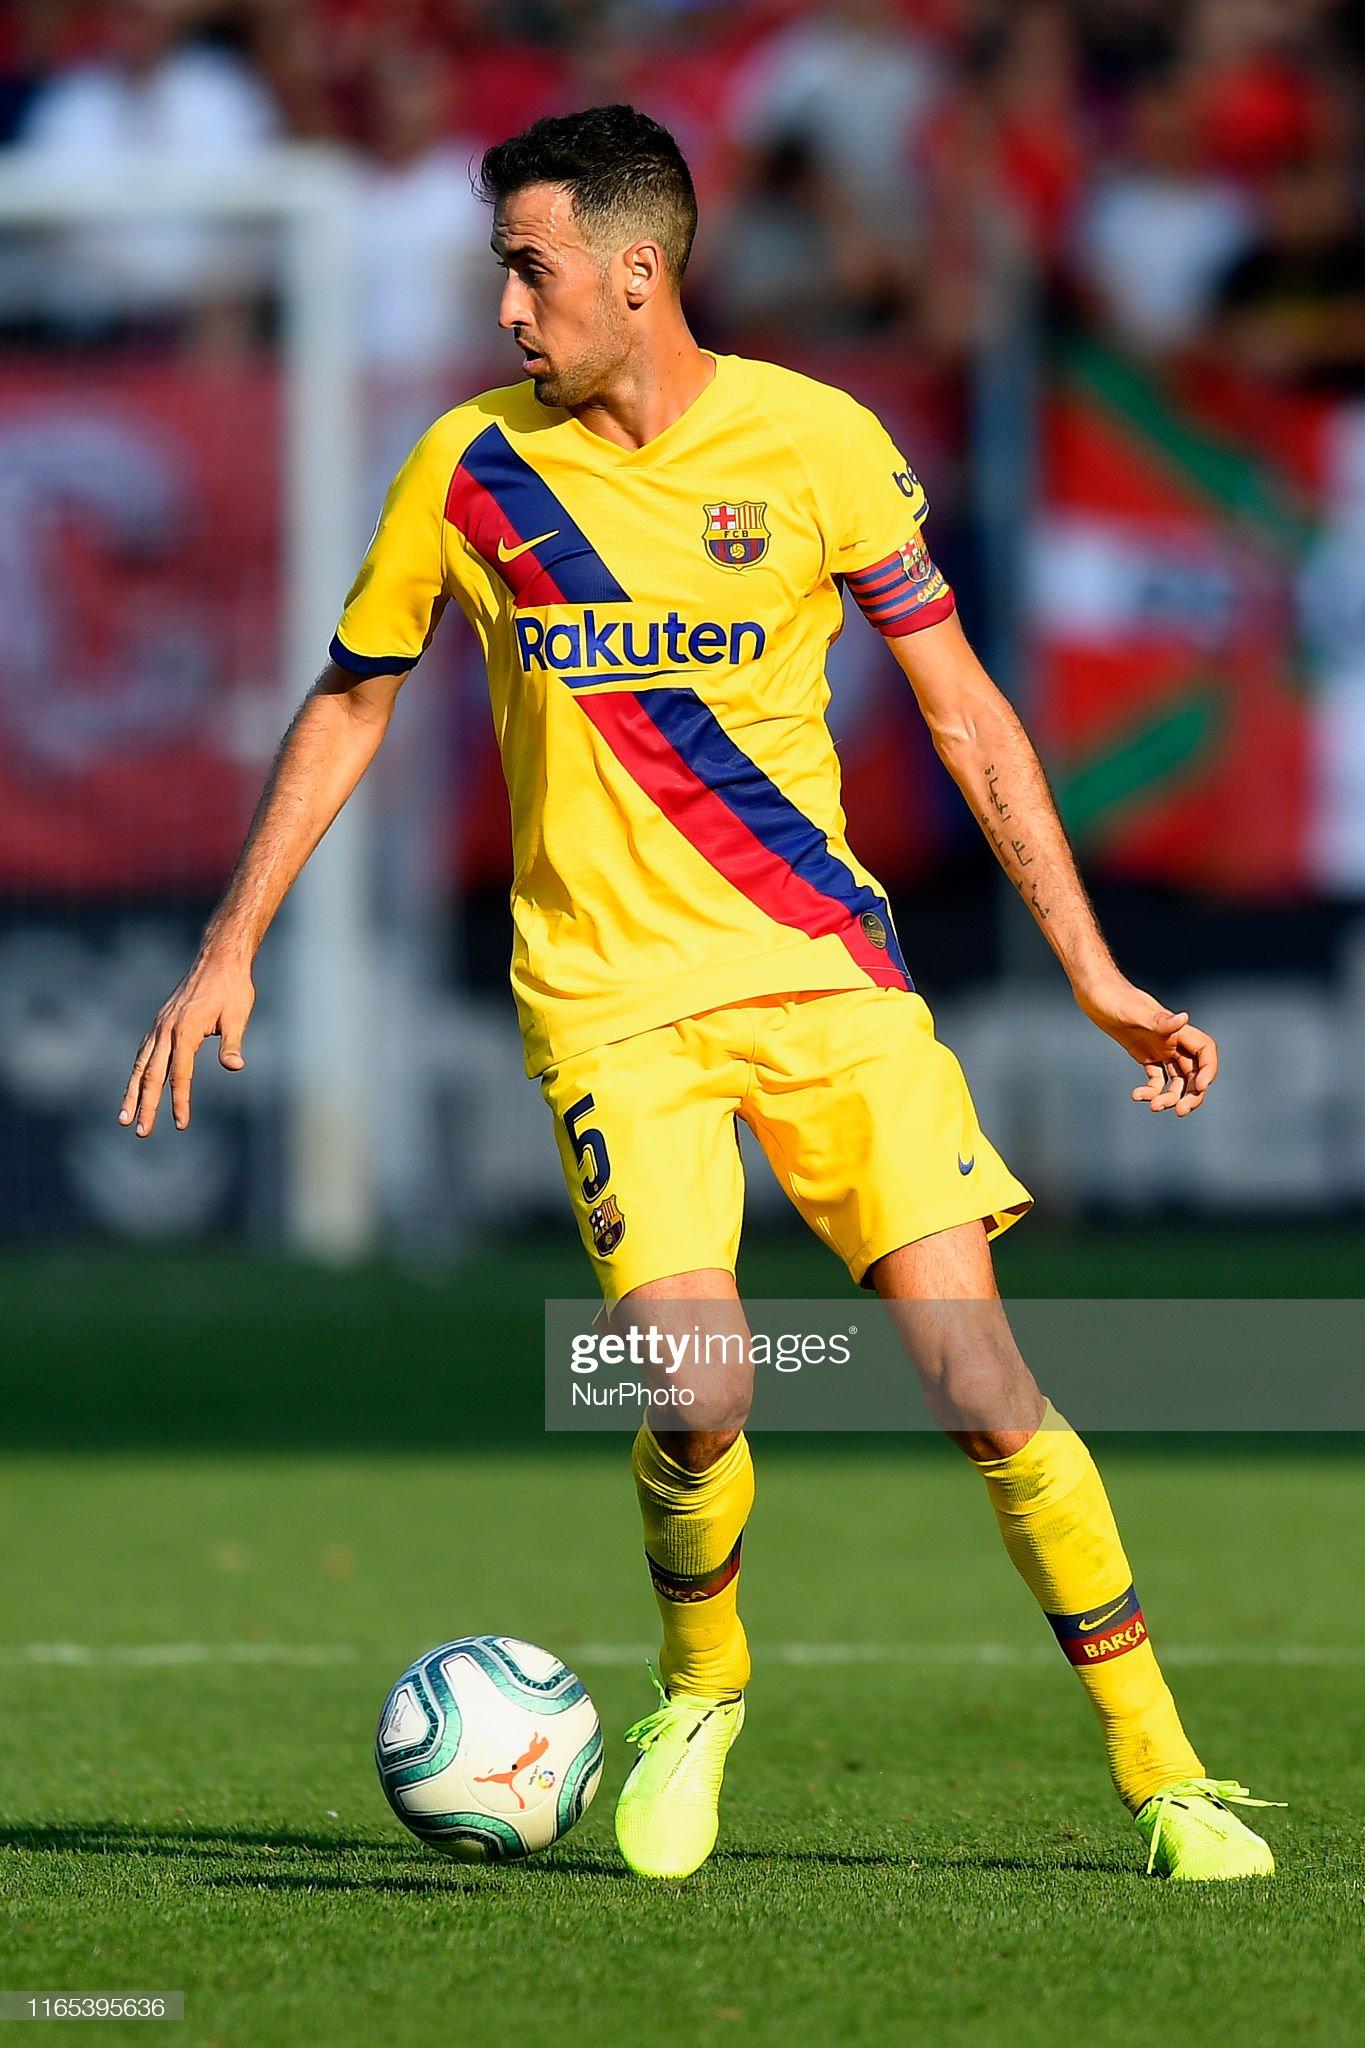 صور مباراة : أوساسونا - برشلونة 2-2 ( 31-08-2019 )  Sergio-busquets-of-barcelona-in-action-during-the-liga-match-between-picture-id1165395636?s=2048x2048